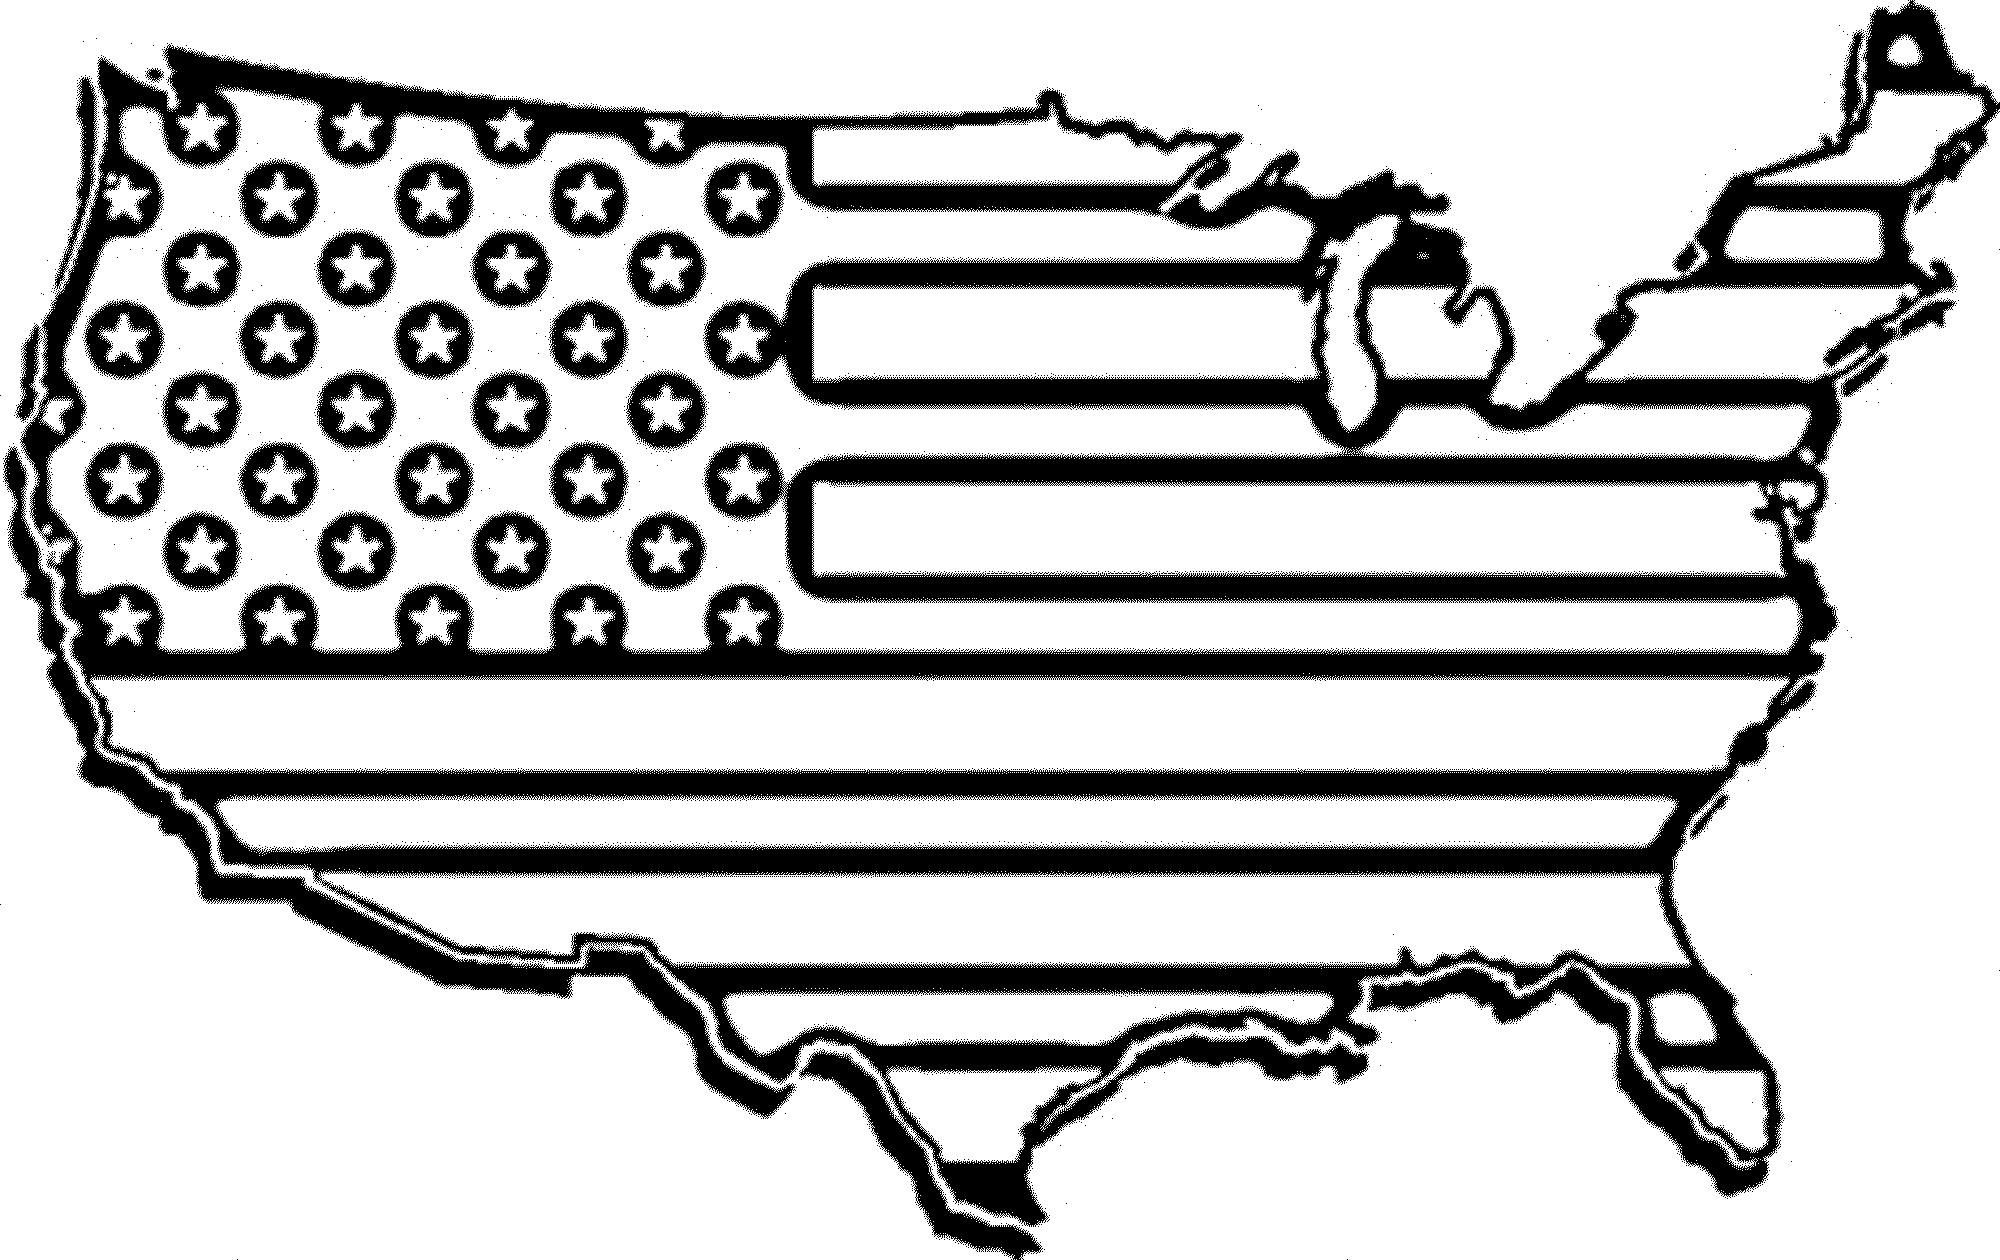 2000x1260 Us Flag American Flag Us Forprint Sm Clipart Clipartix